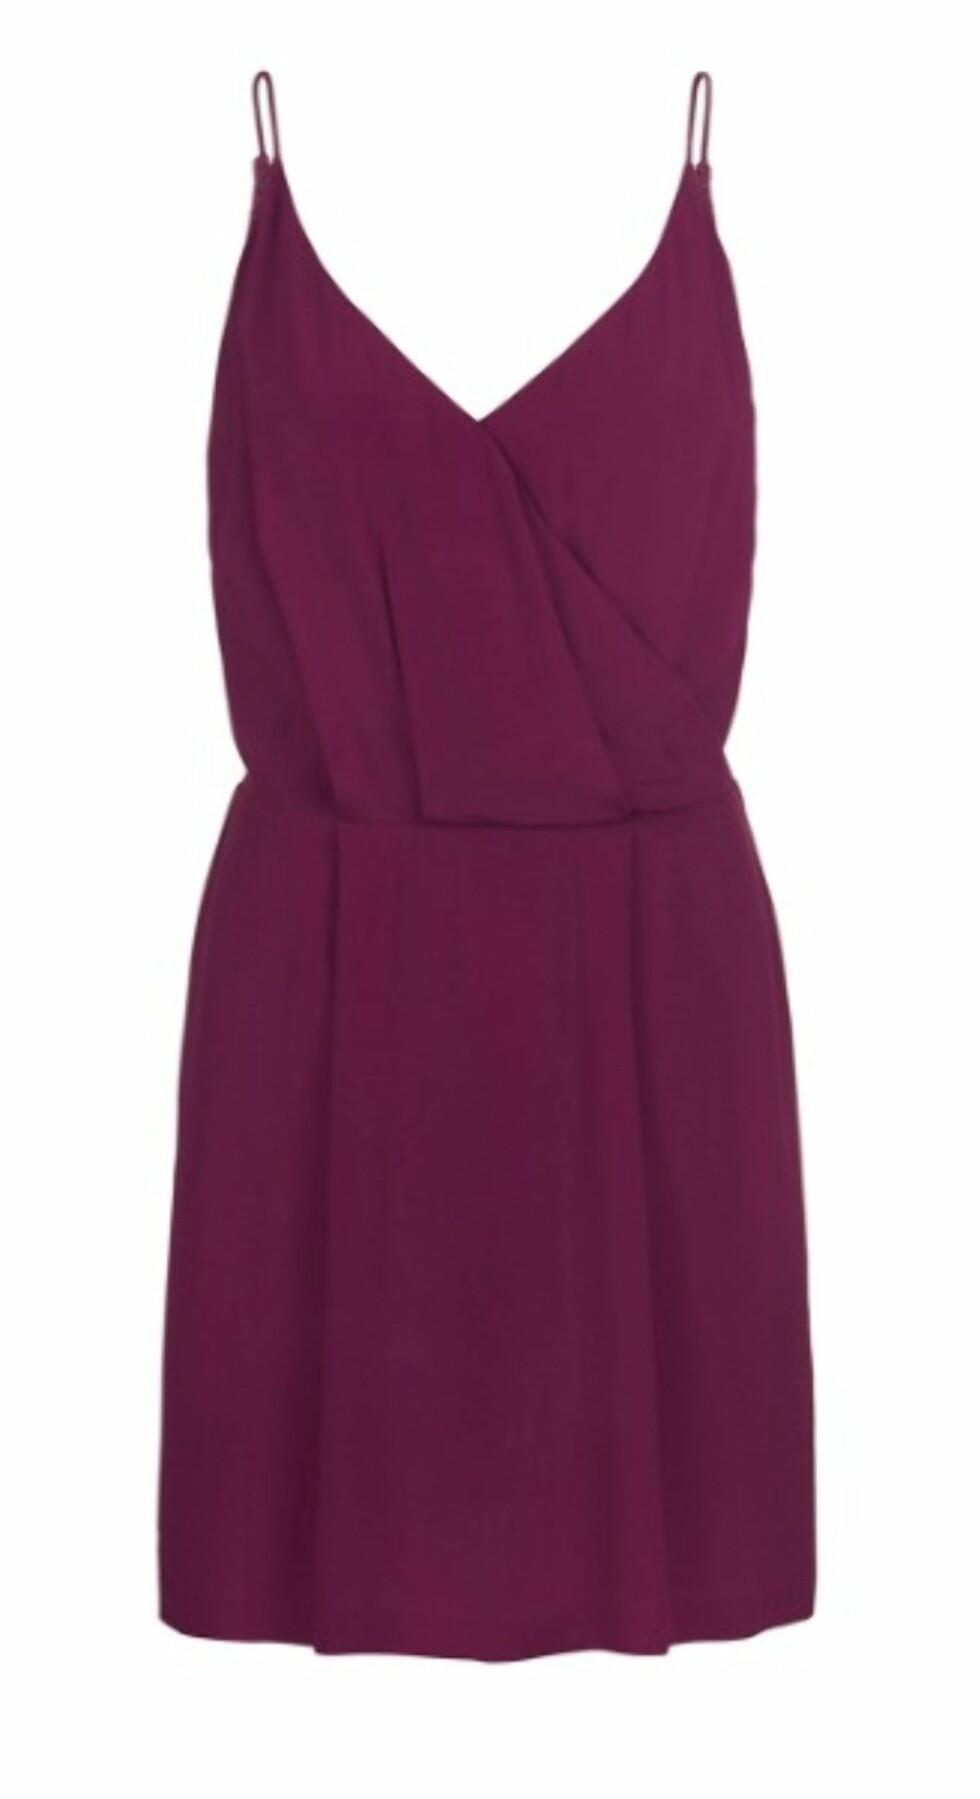 <strong>Kjole fra Samsøe & Samsøe   kr 700   http:</strong>//www.samsoe.com/shop/shop-woman/dress/ginni-s-dress-6515-f16402628/dark-purple/